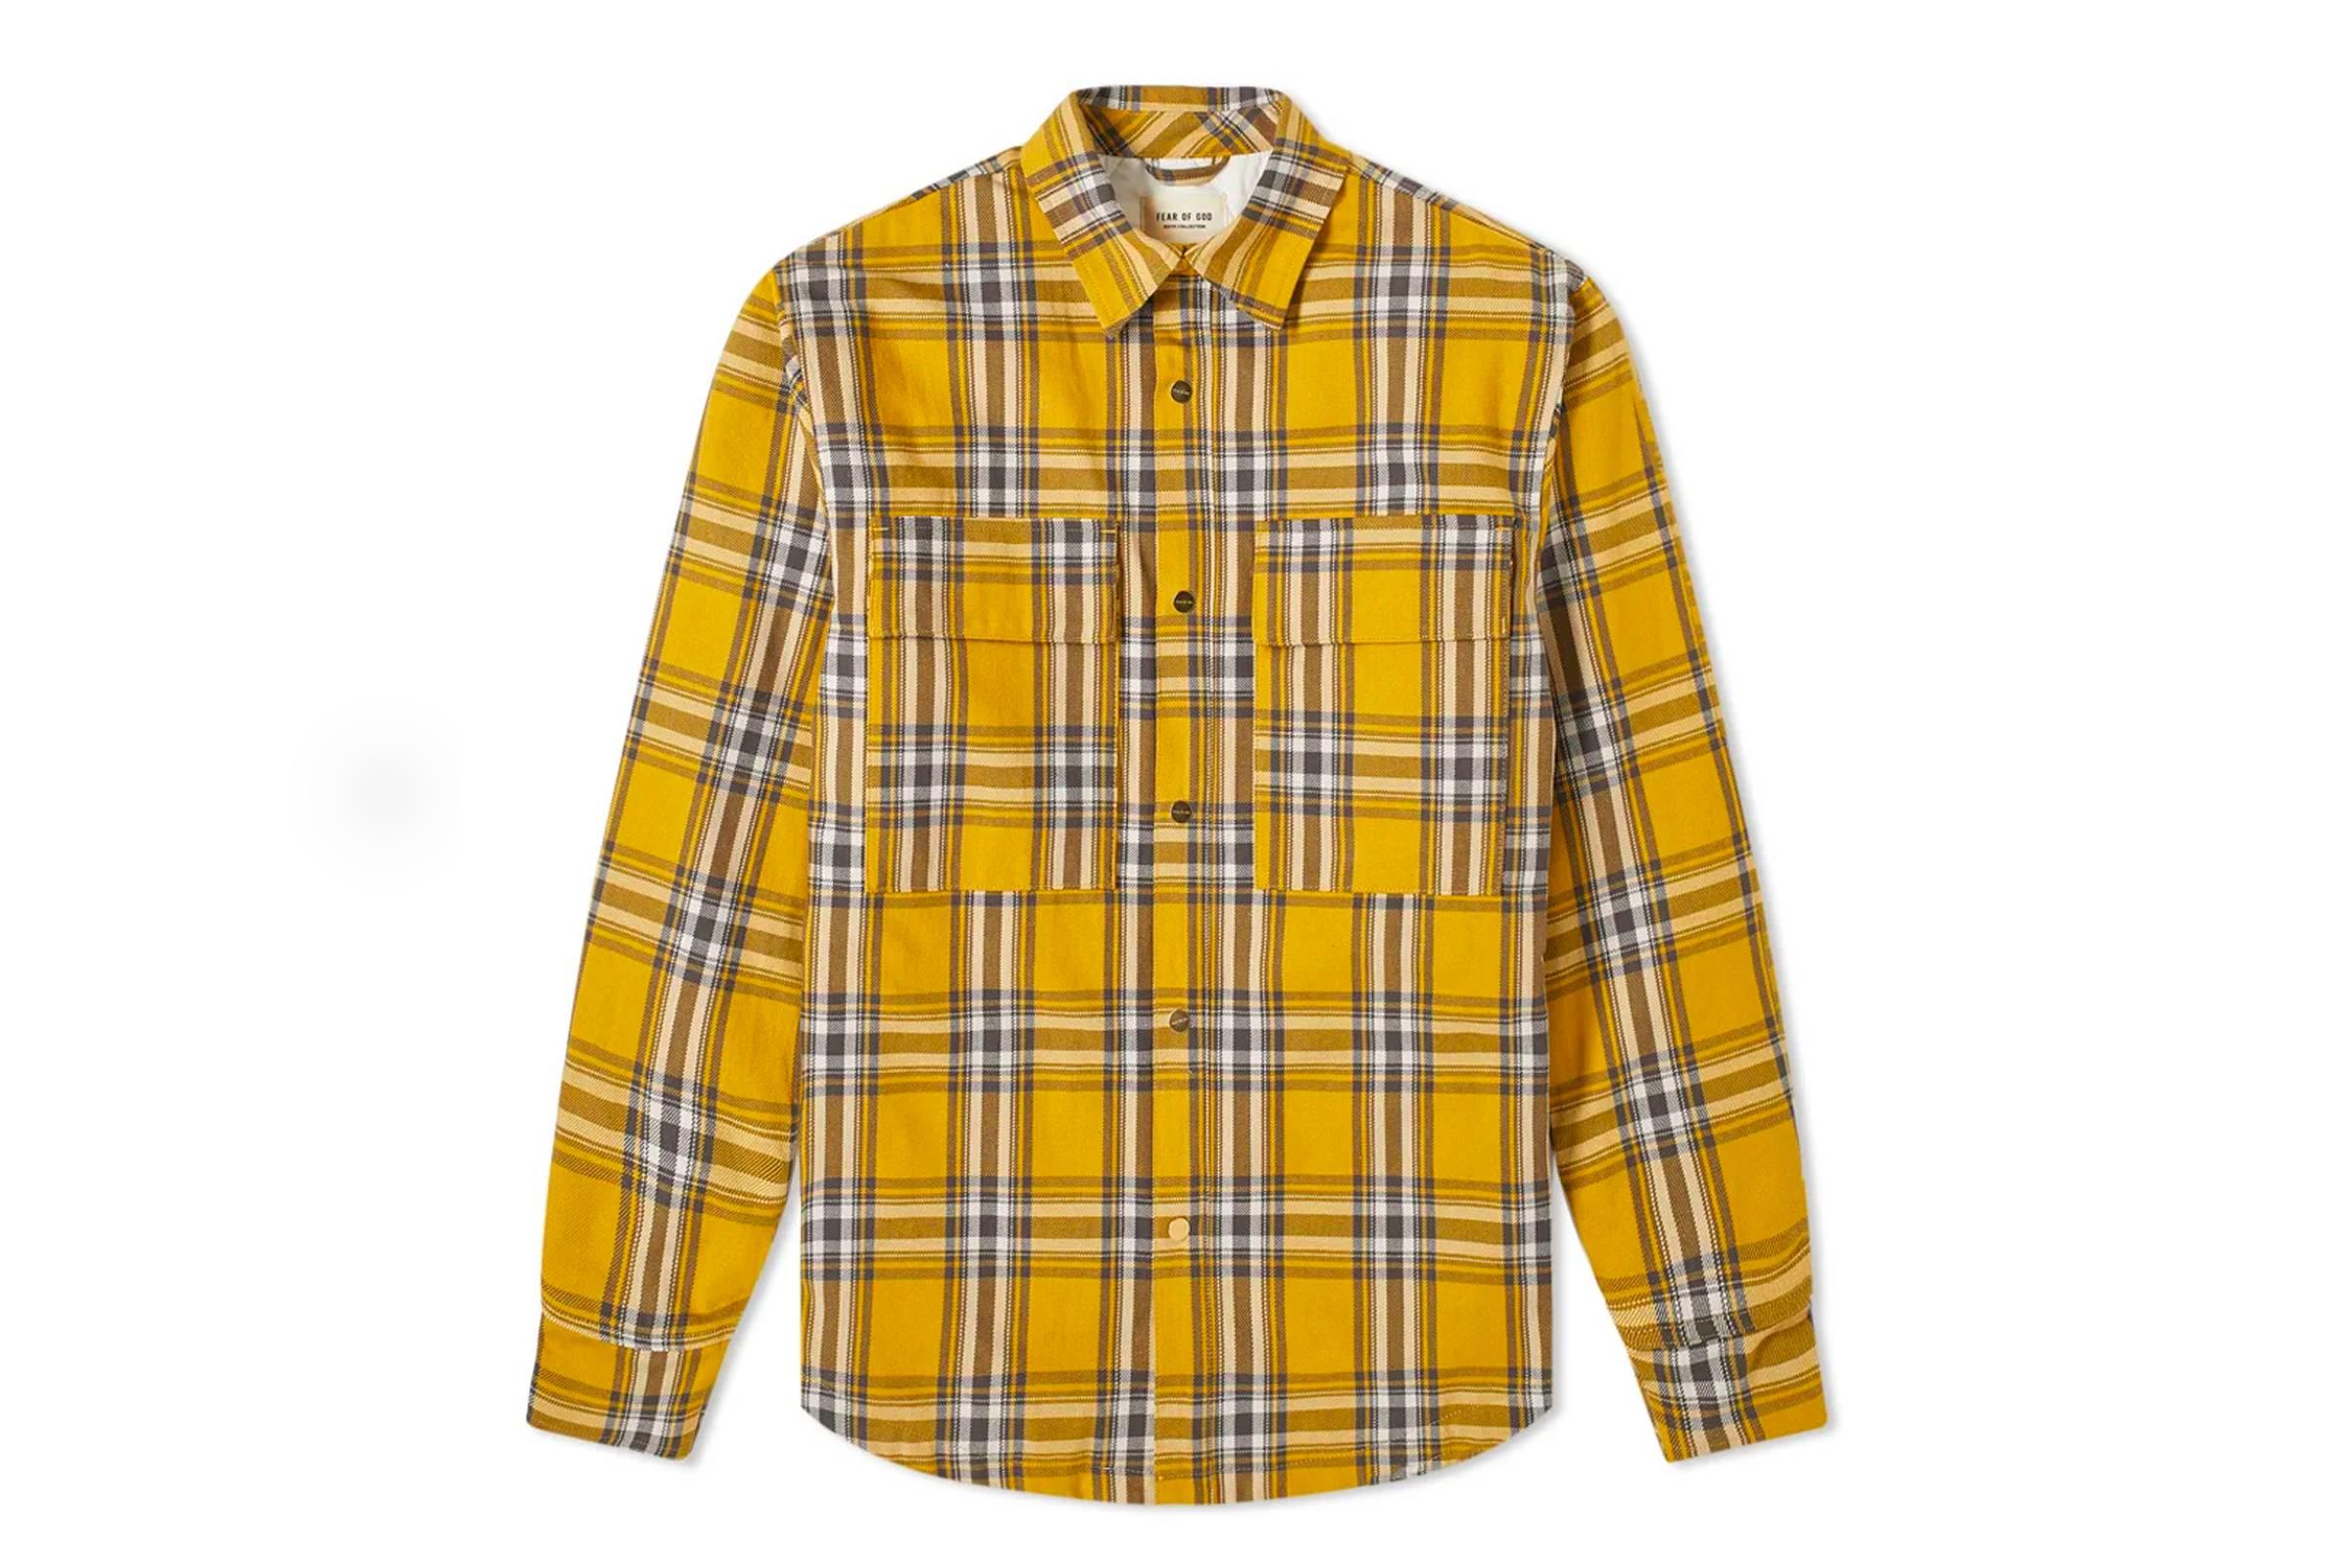 6. Fear of God Flannel Shirt Jacket